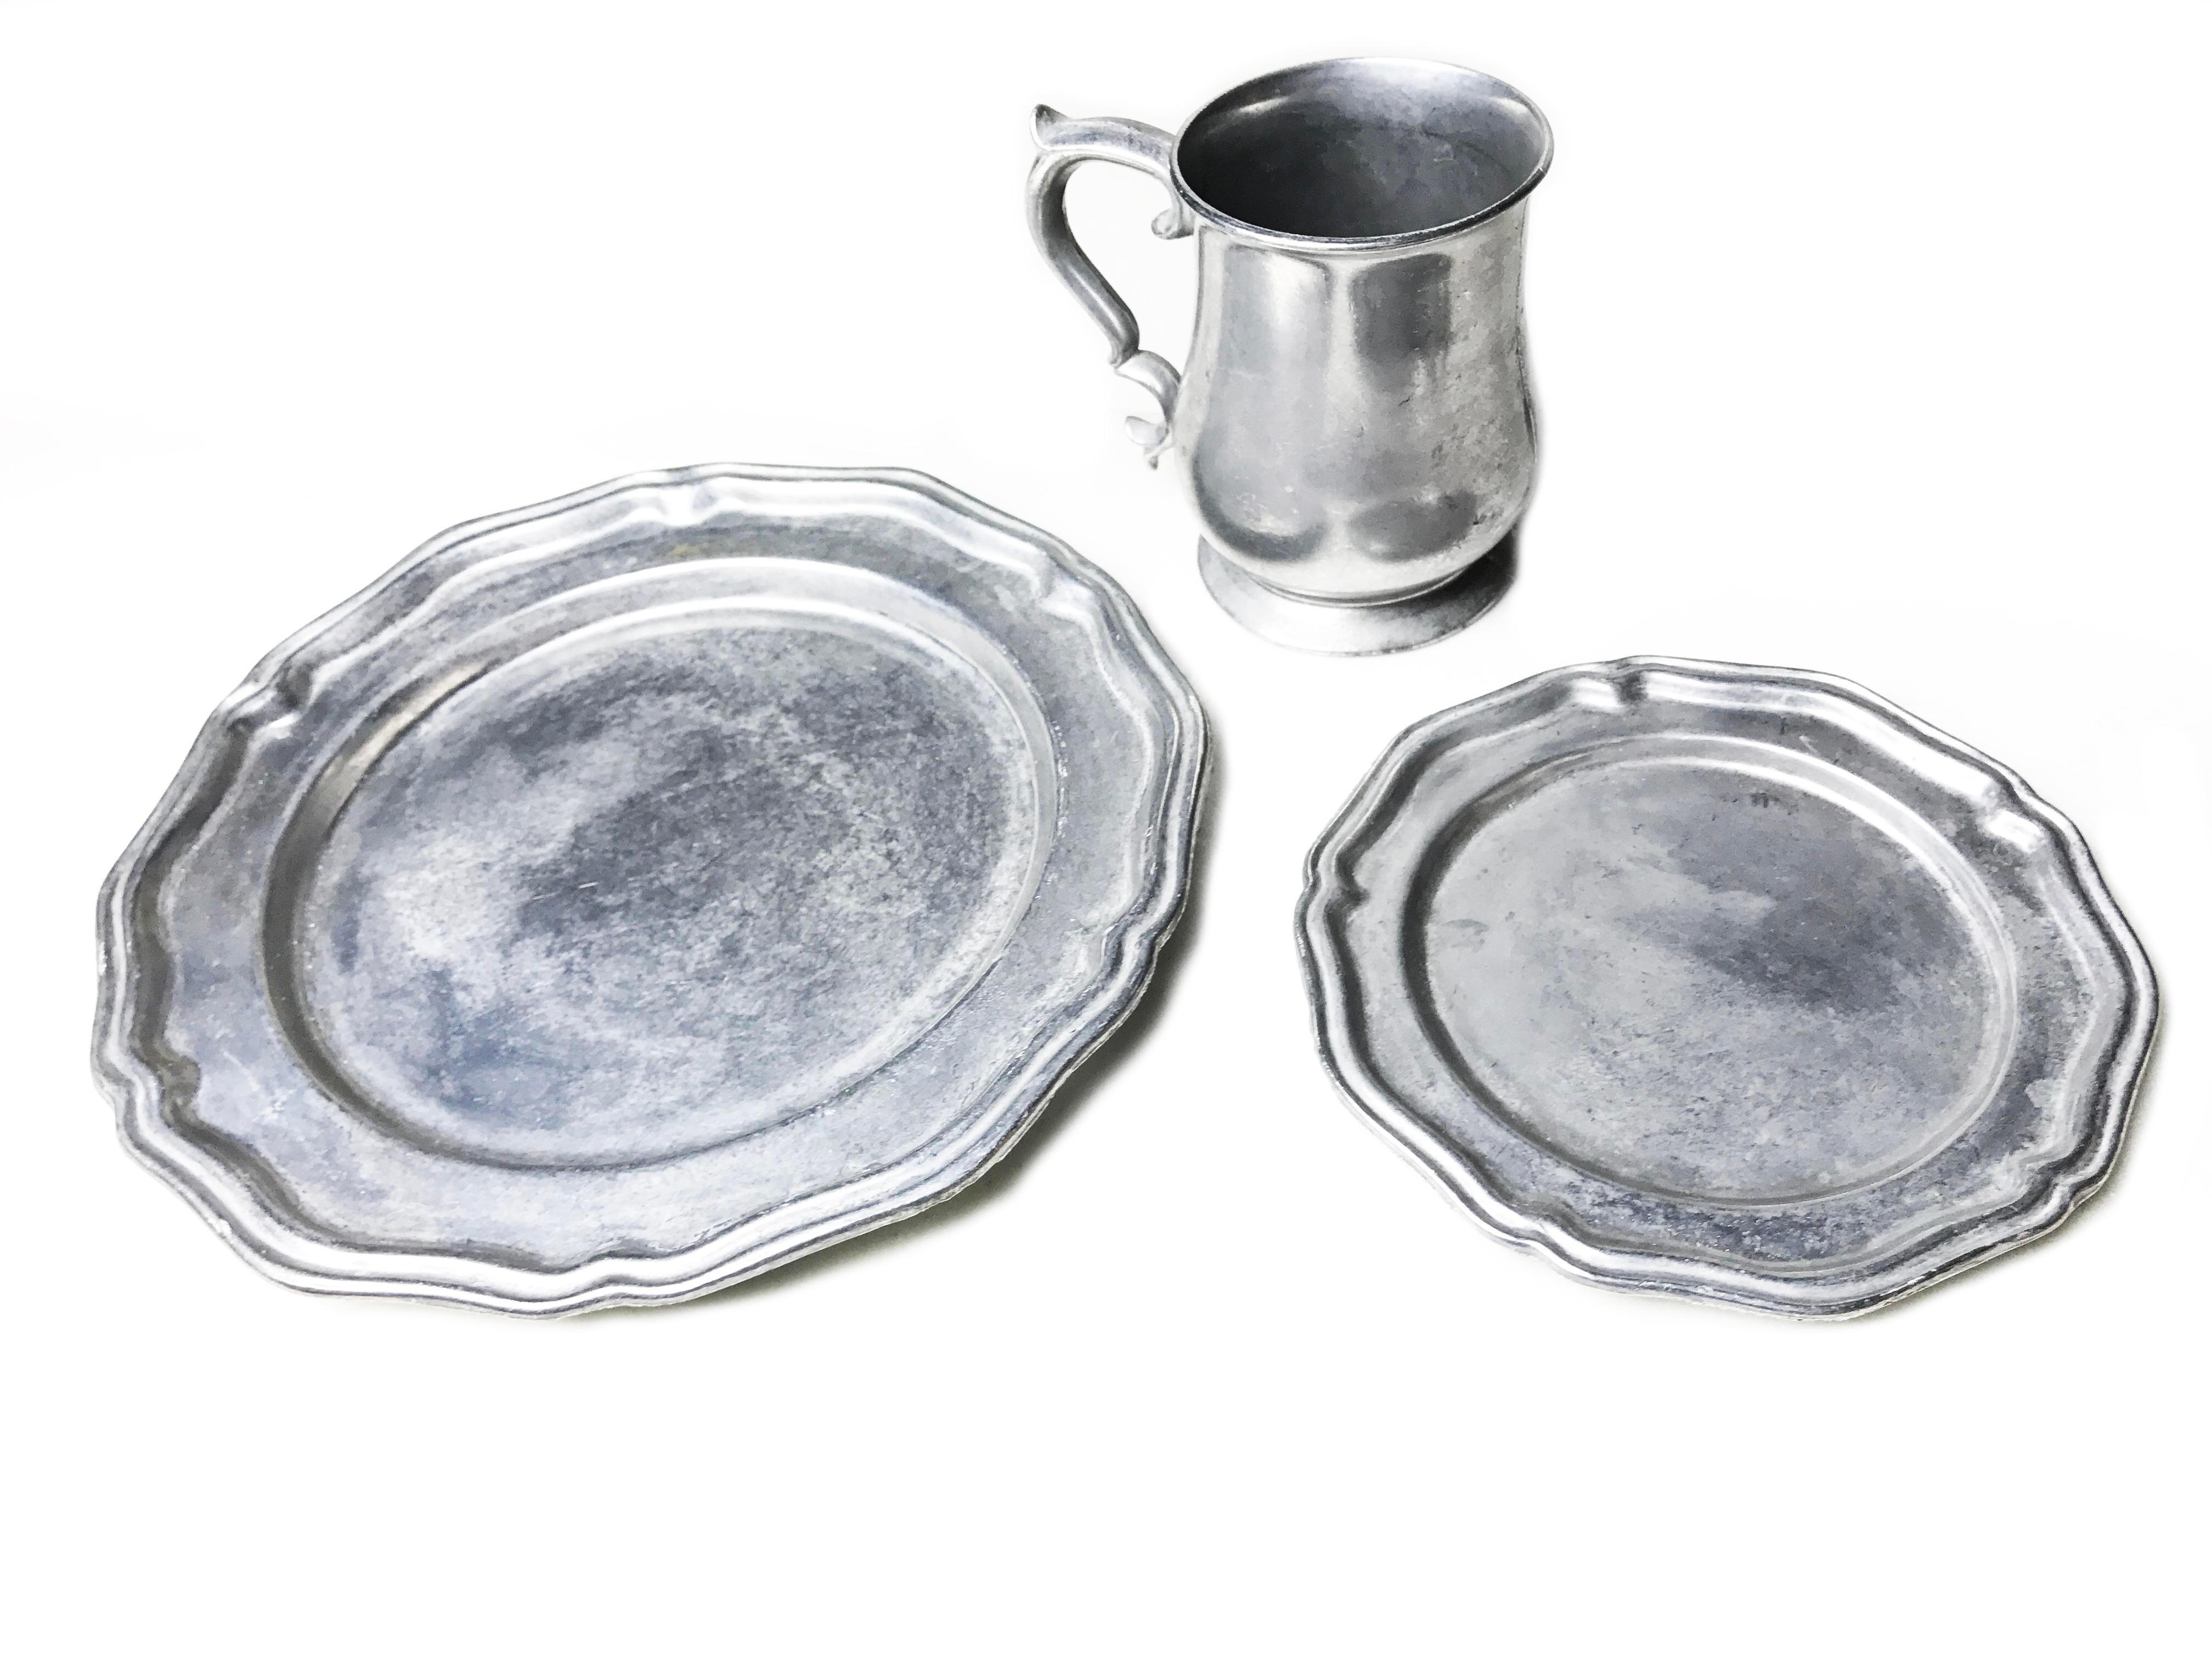 Crown Castle Aluminum Alloy Dinnerware - Image 2 of 3  sc 1 st  Chairish & Crown Castle Aluminum Alloy Dinnerware | Chairish